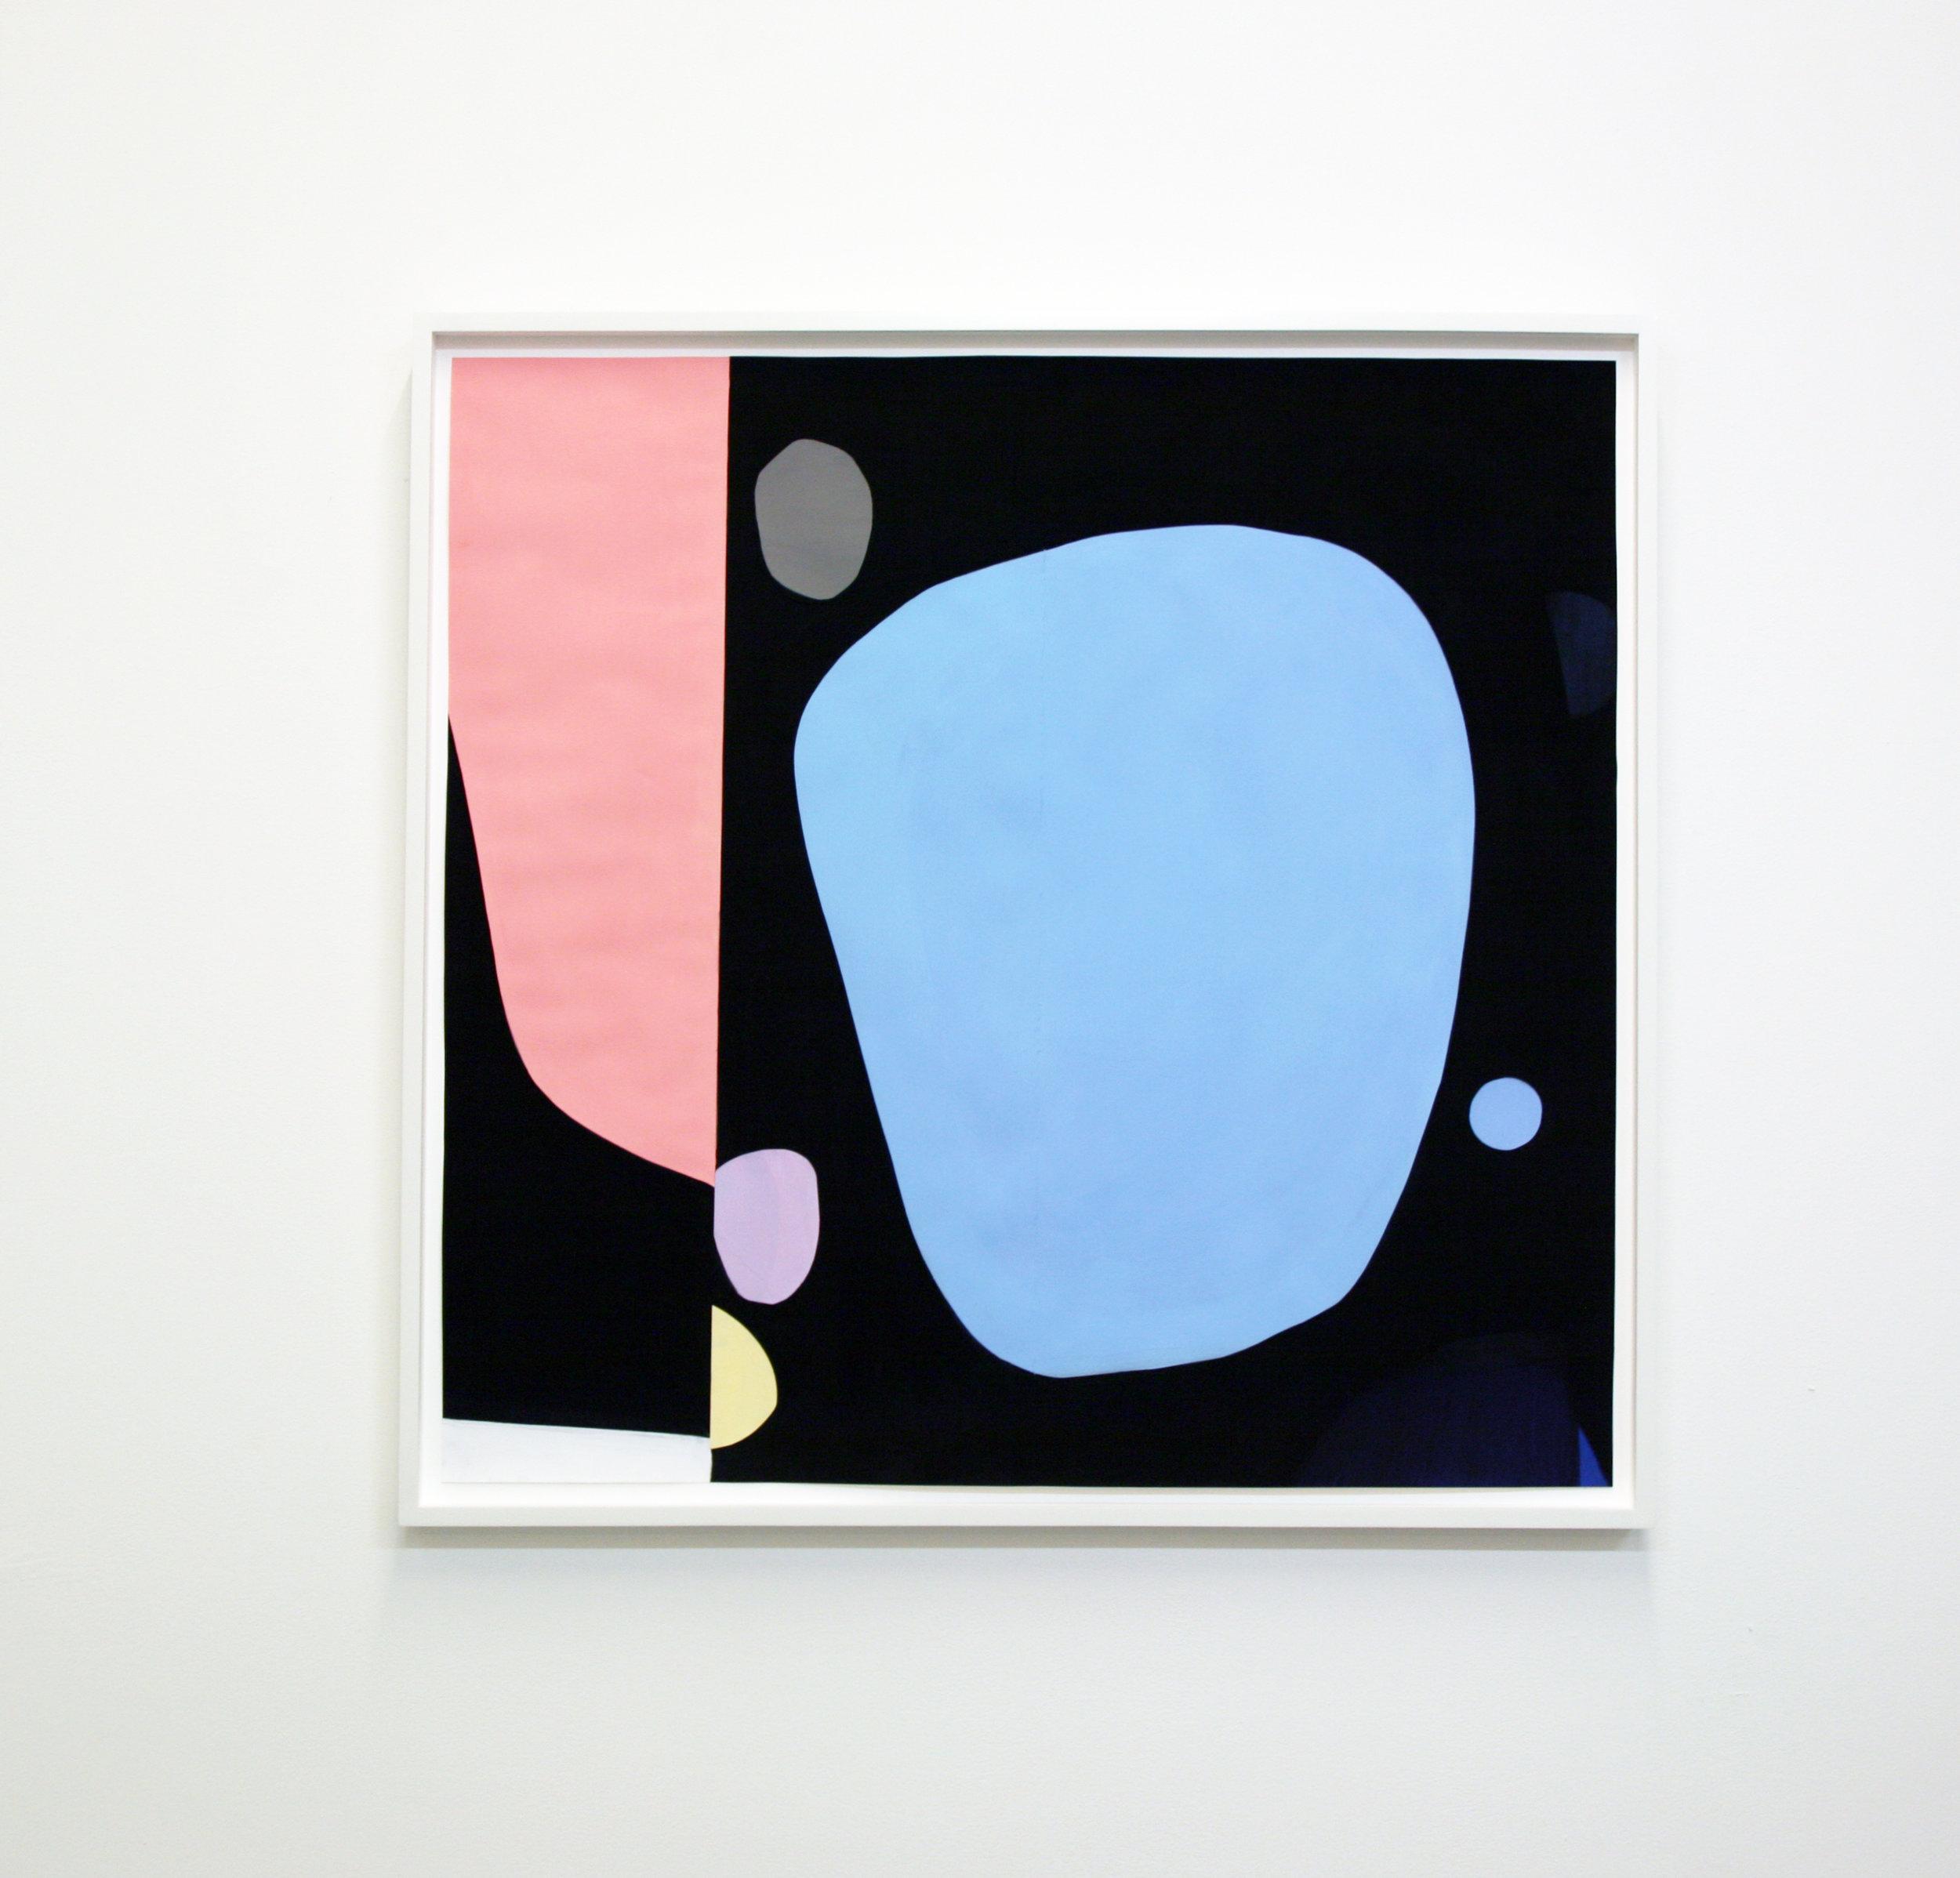 Scott Treleaven   Mayfair  2017 Gouache, acrylic and collage on paper 92,1 x 95,3 cm